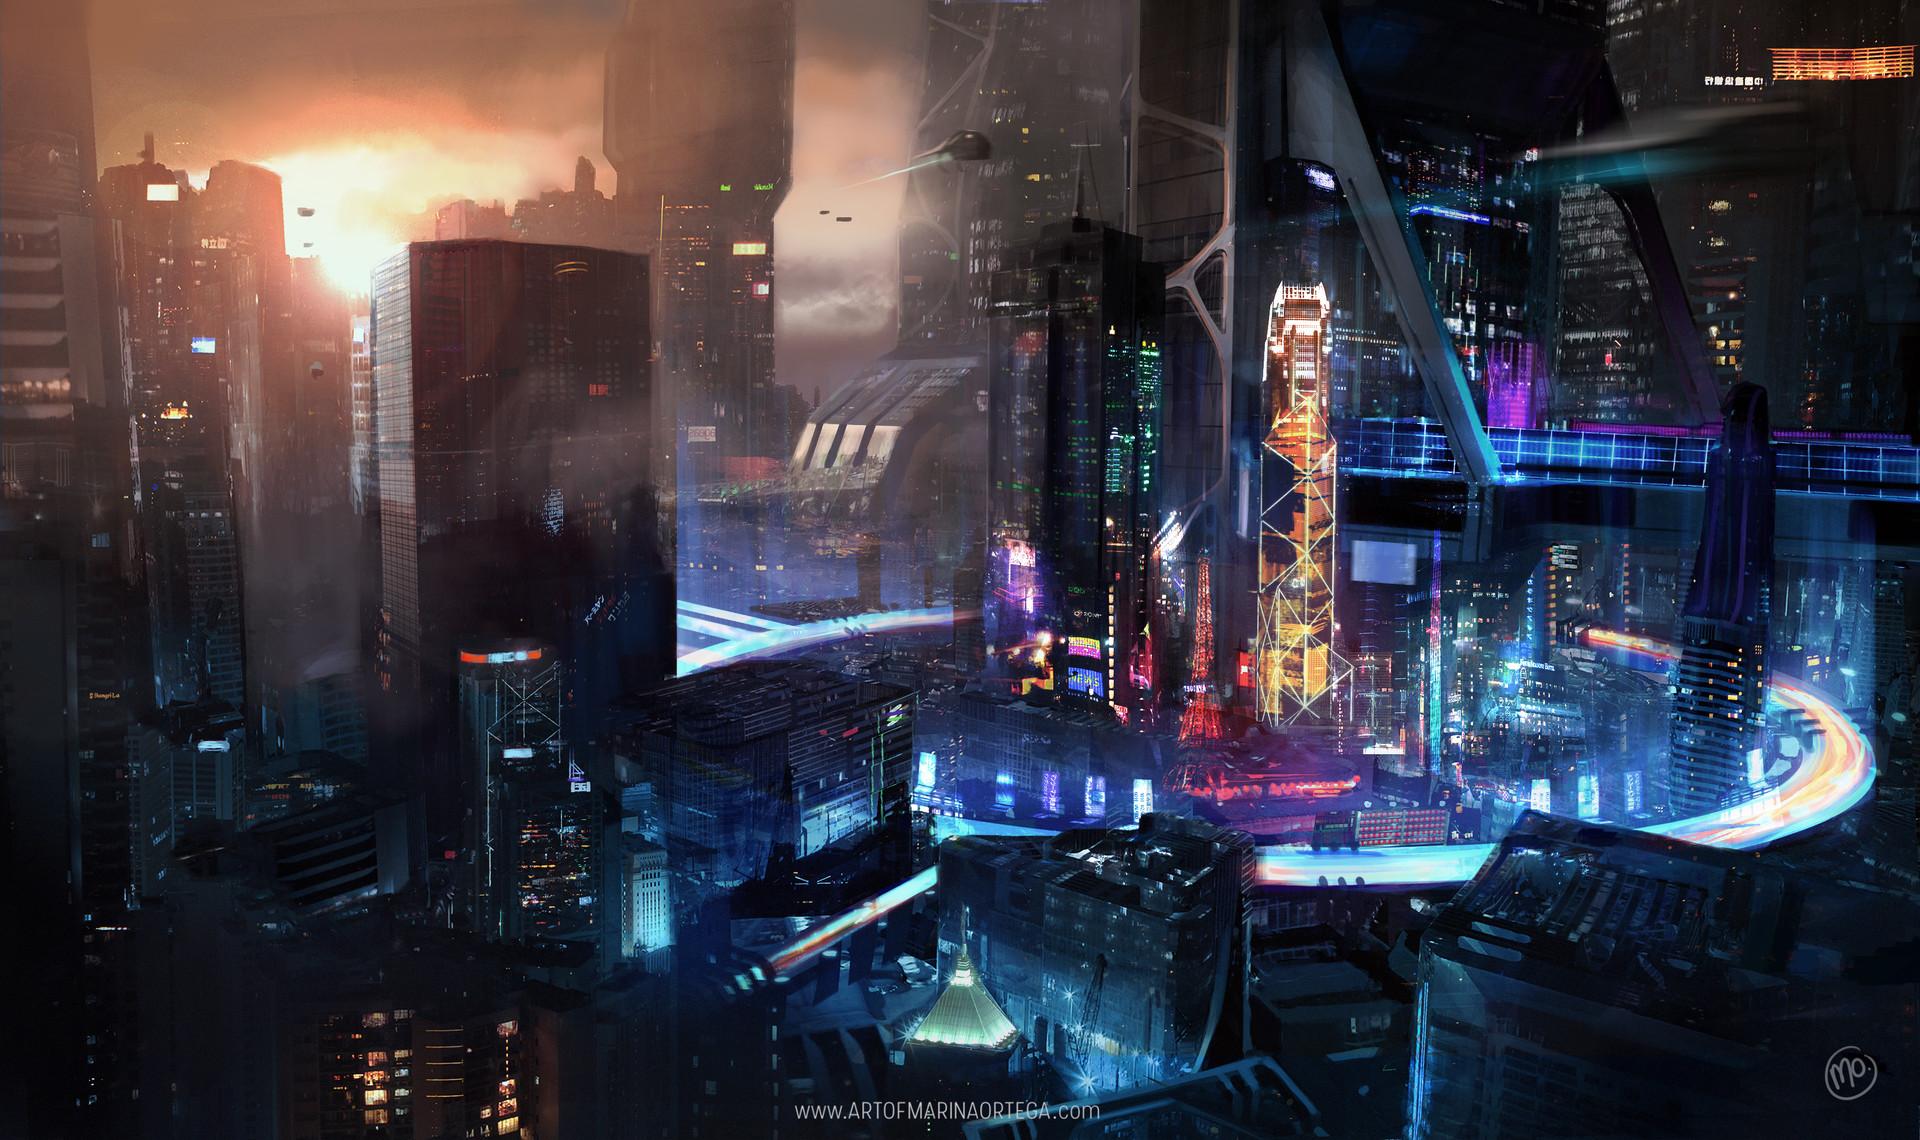 General 1920x1140 cyber cyber cyberpunk science fiction fantasy art digital art futuristic